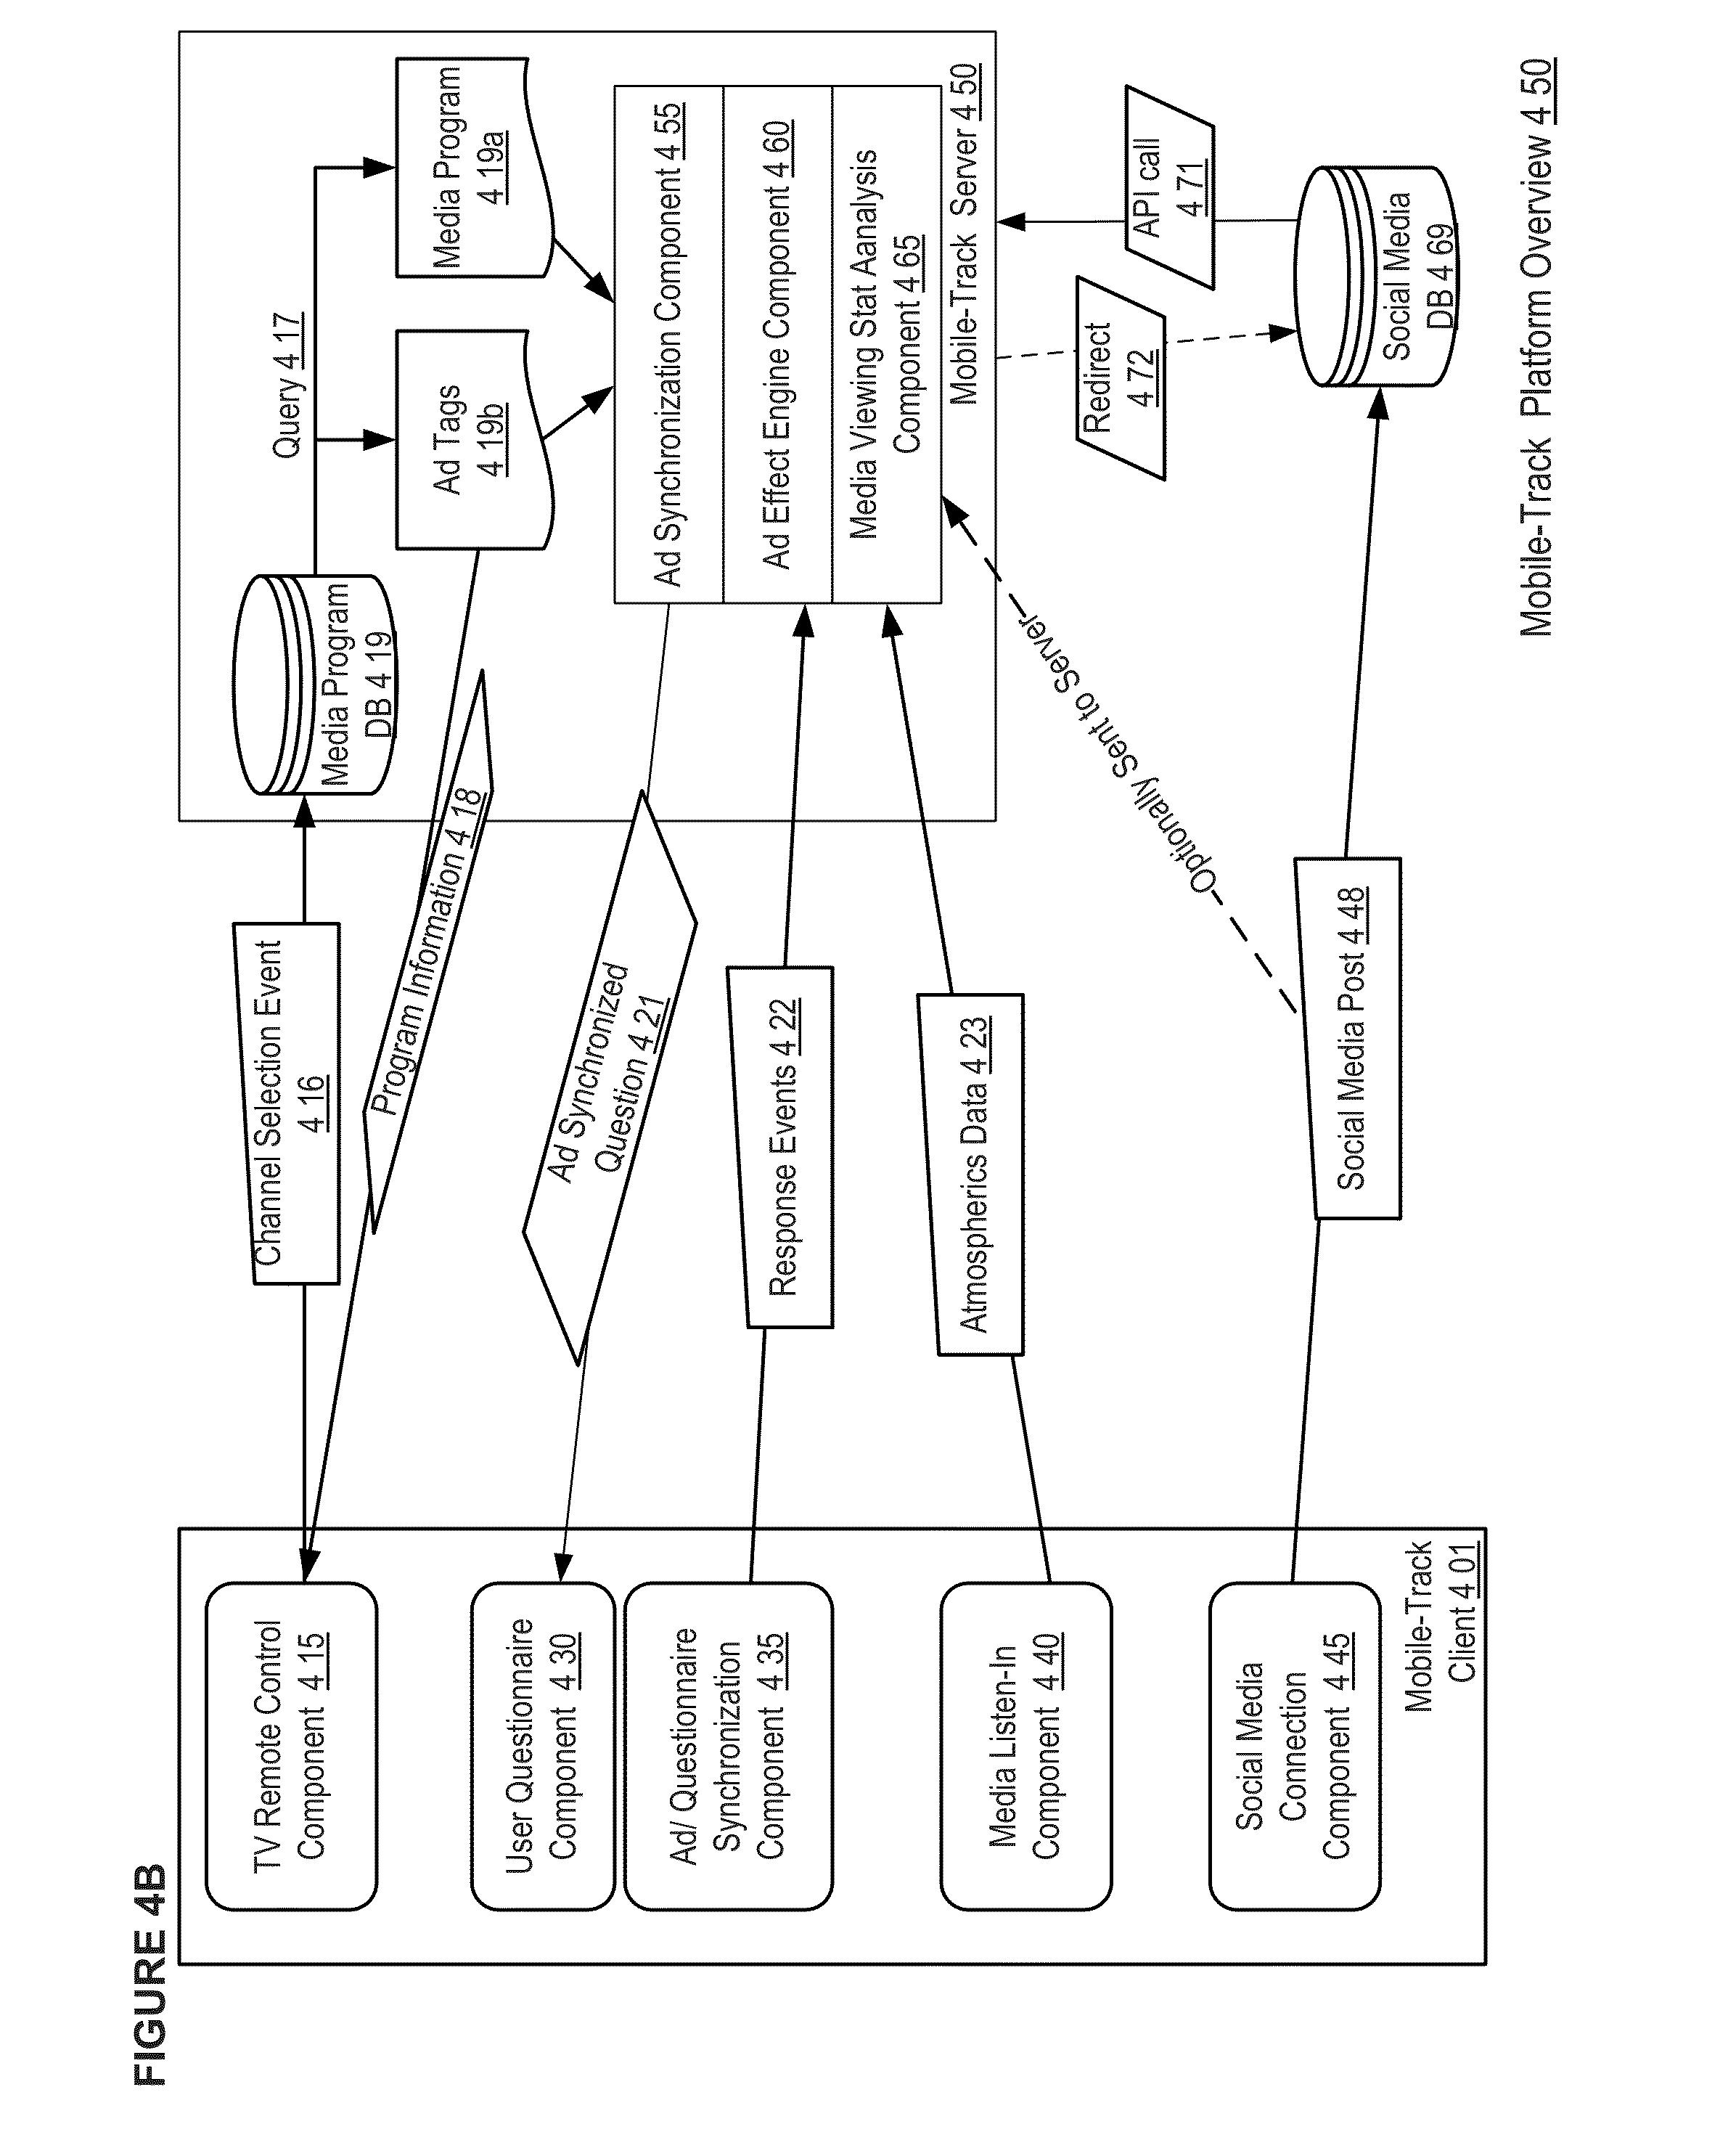 Patent US 8,650,587 B2